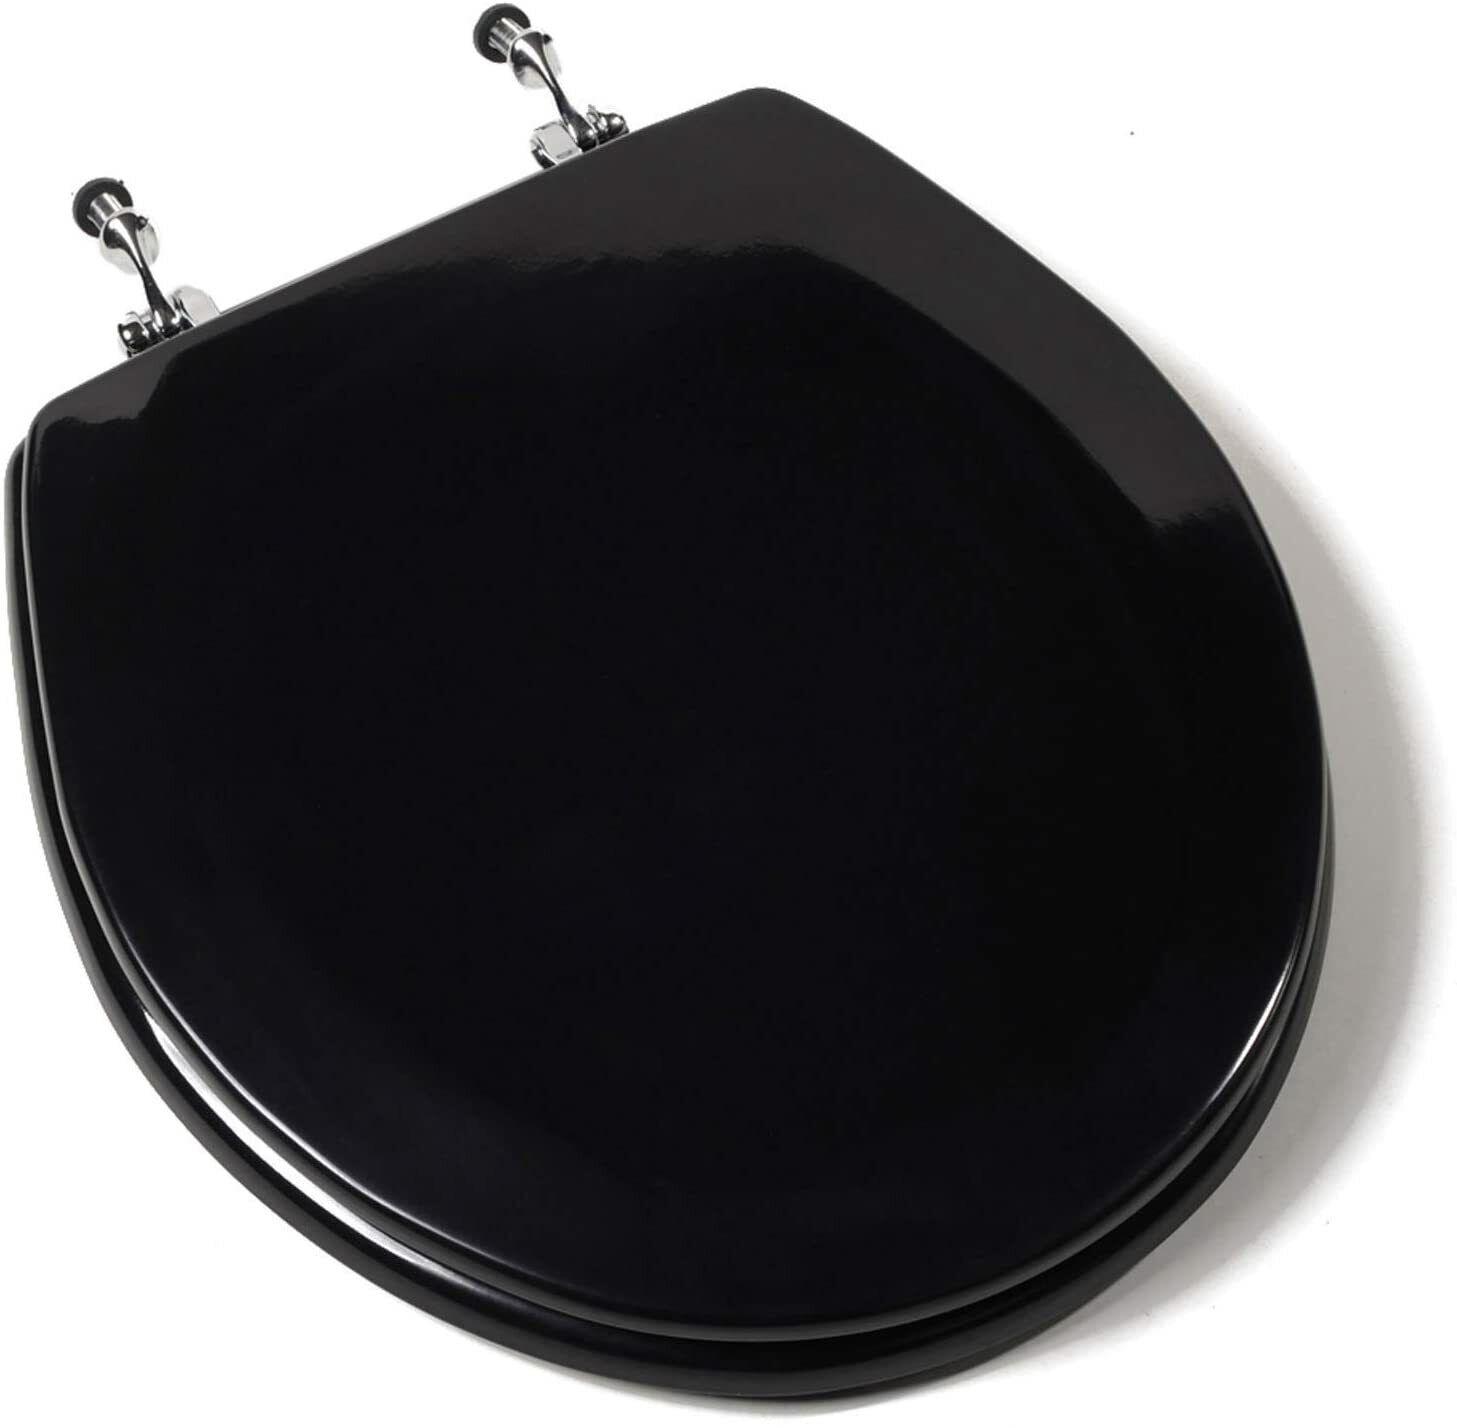 Deluxe Black Wood Round Toilet Seat – Chrome Hinges Bath